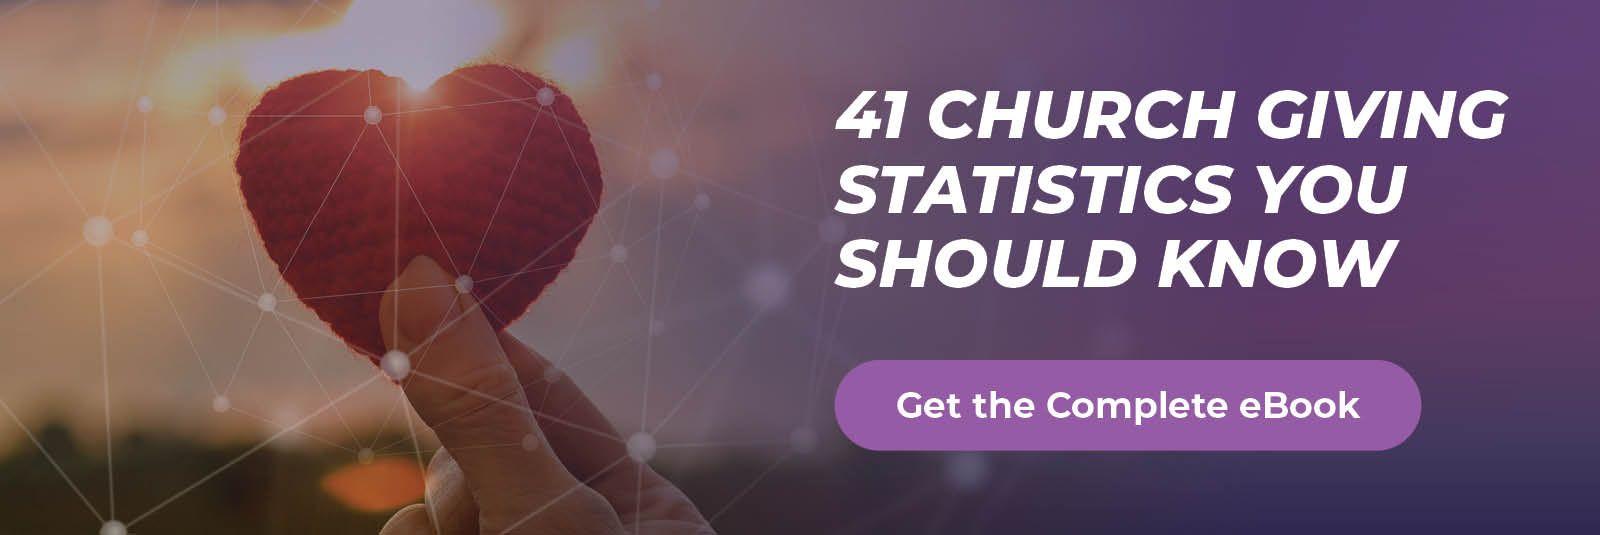 41-Church-Giving-Stats-LP-Header-0420